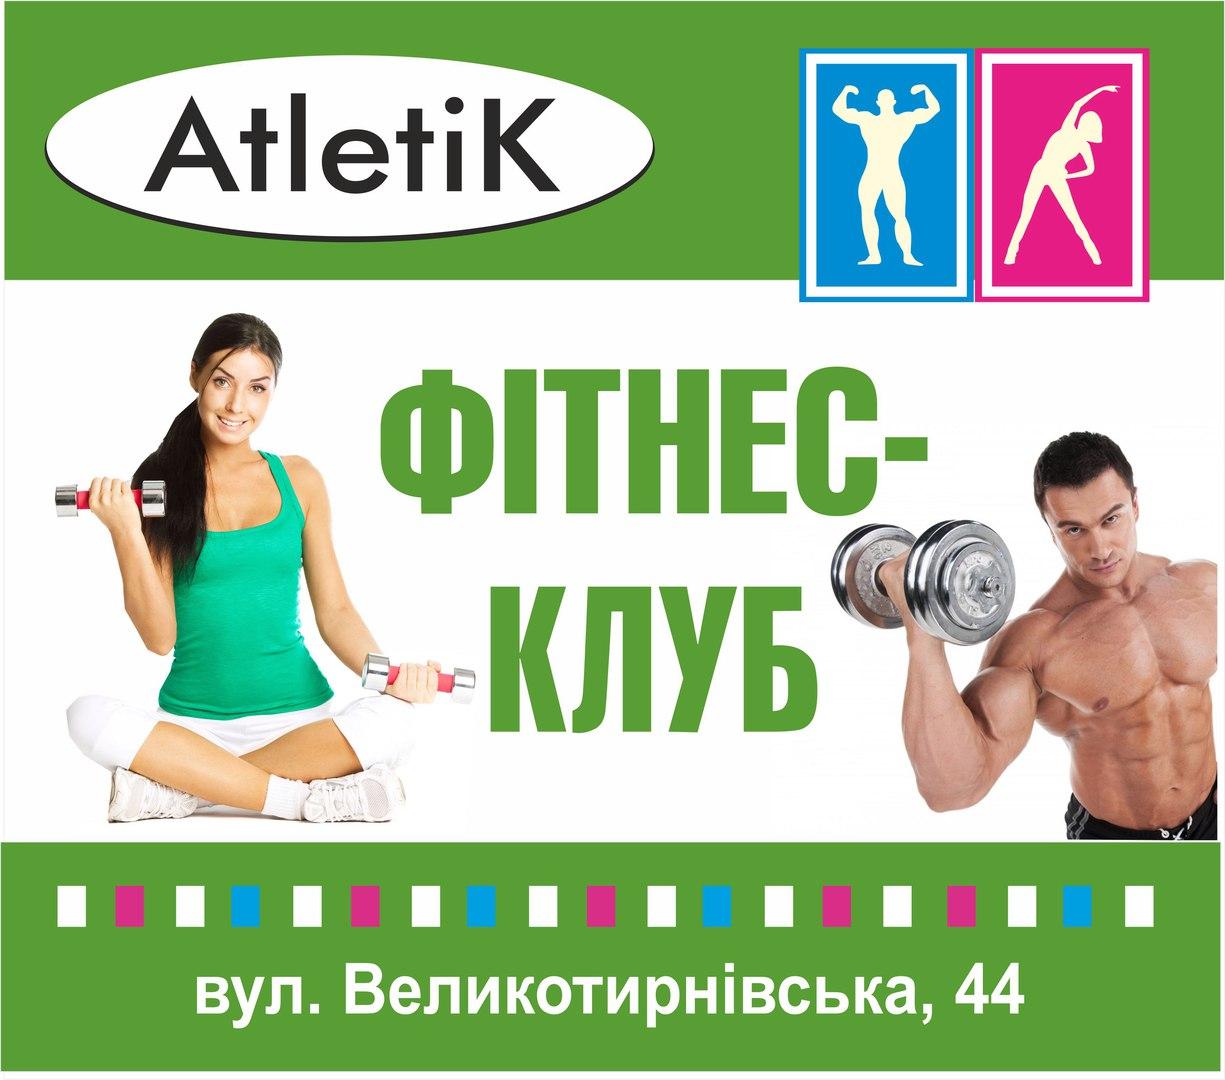 Atletik - Атлетик